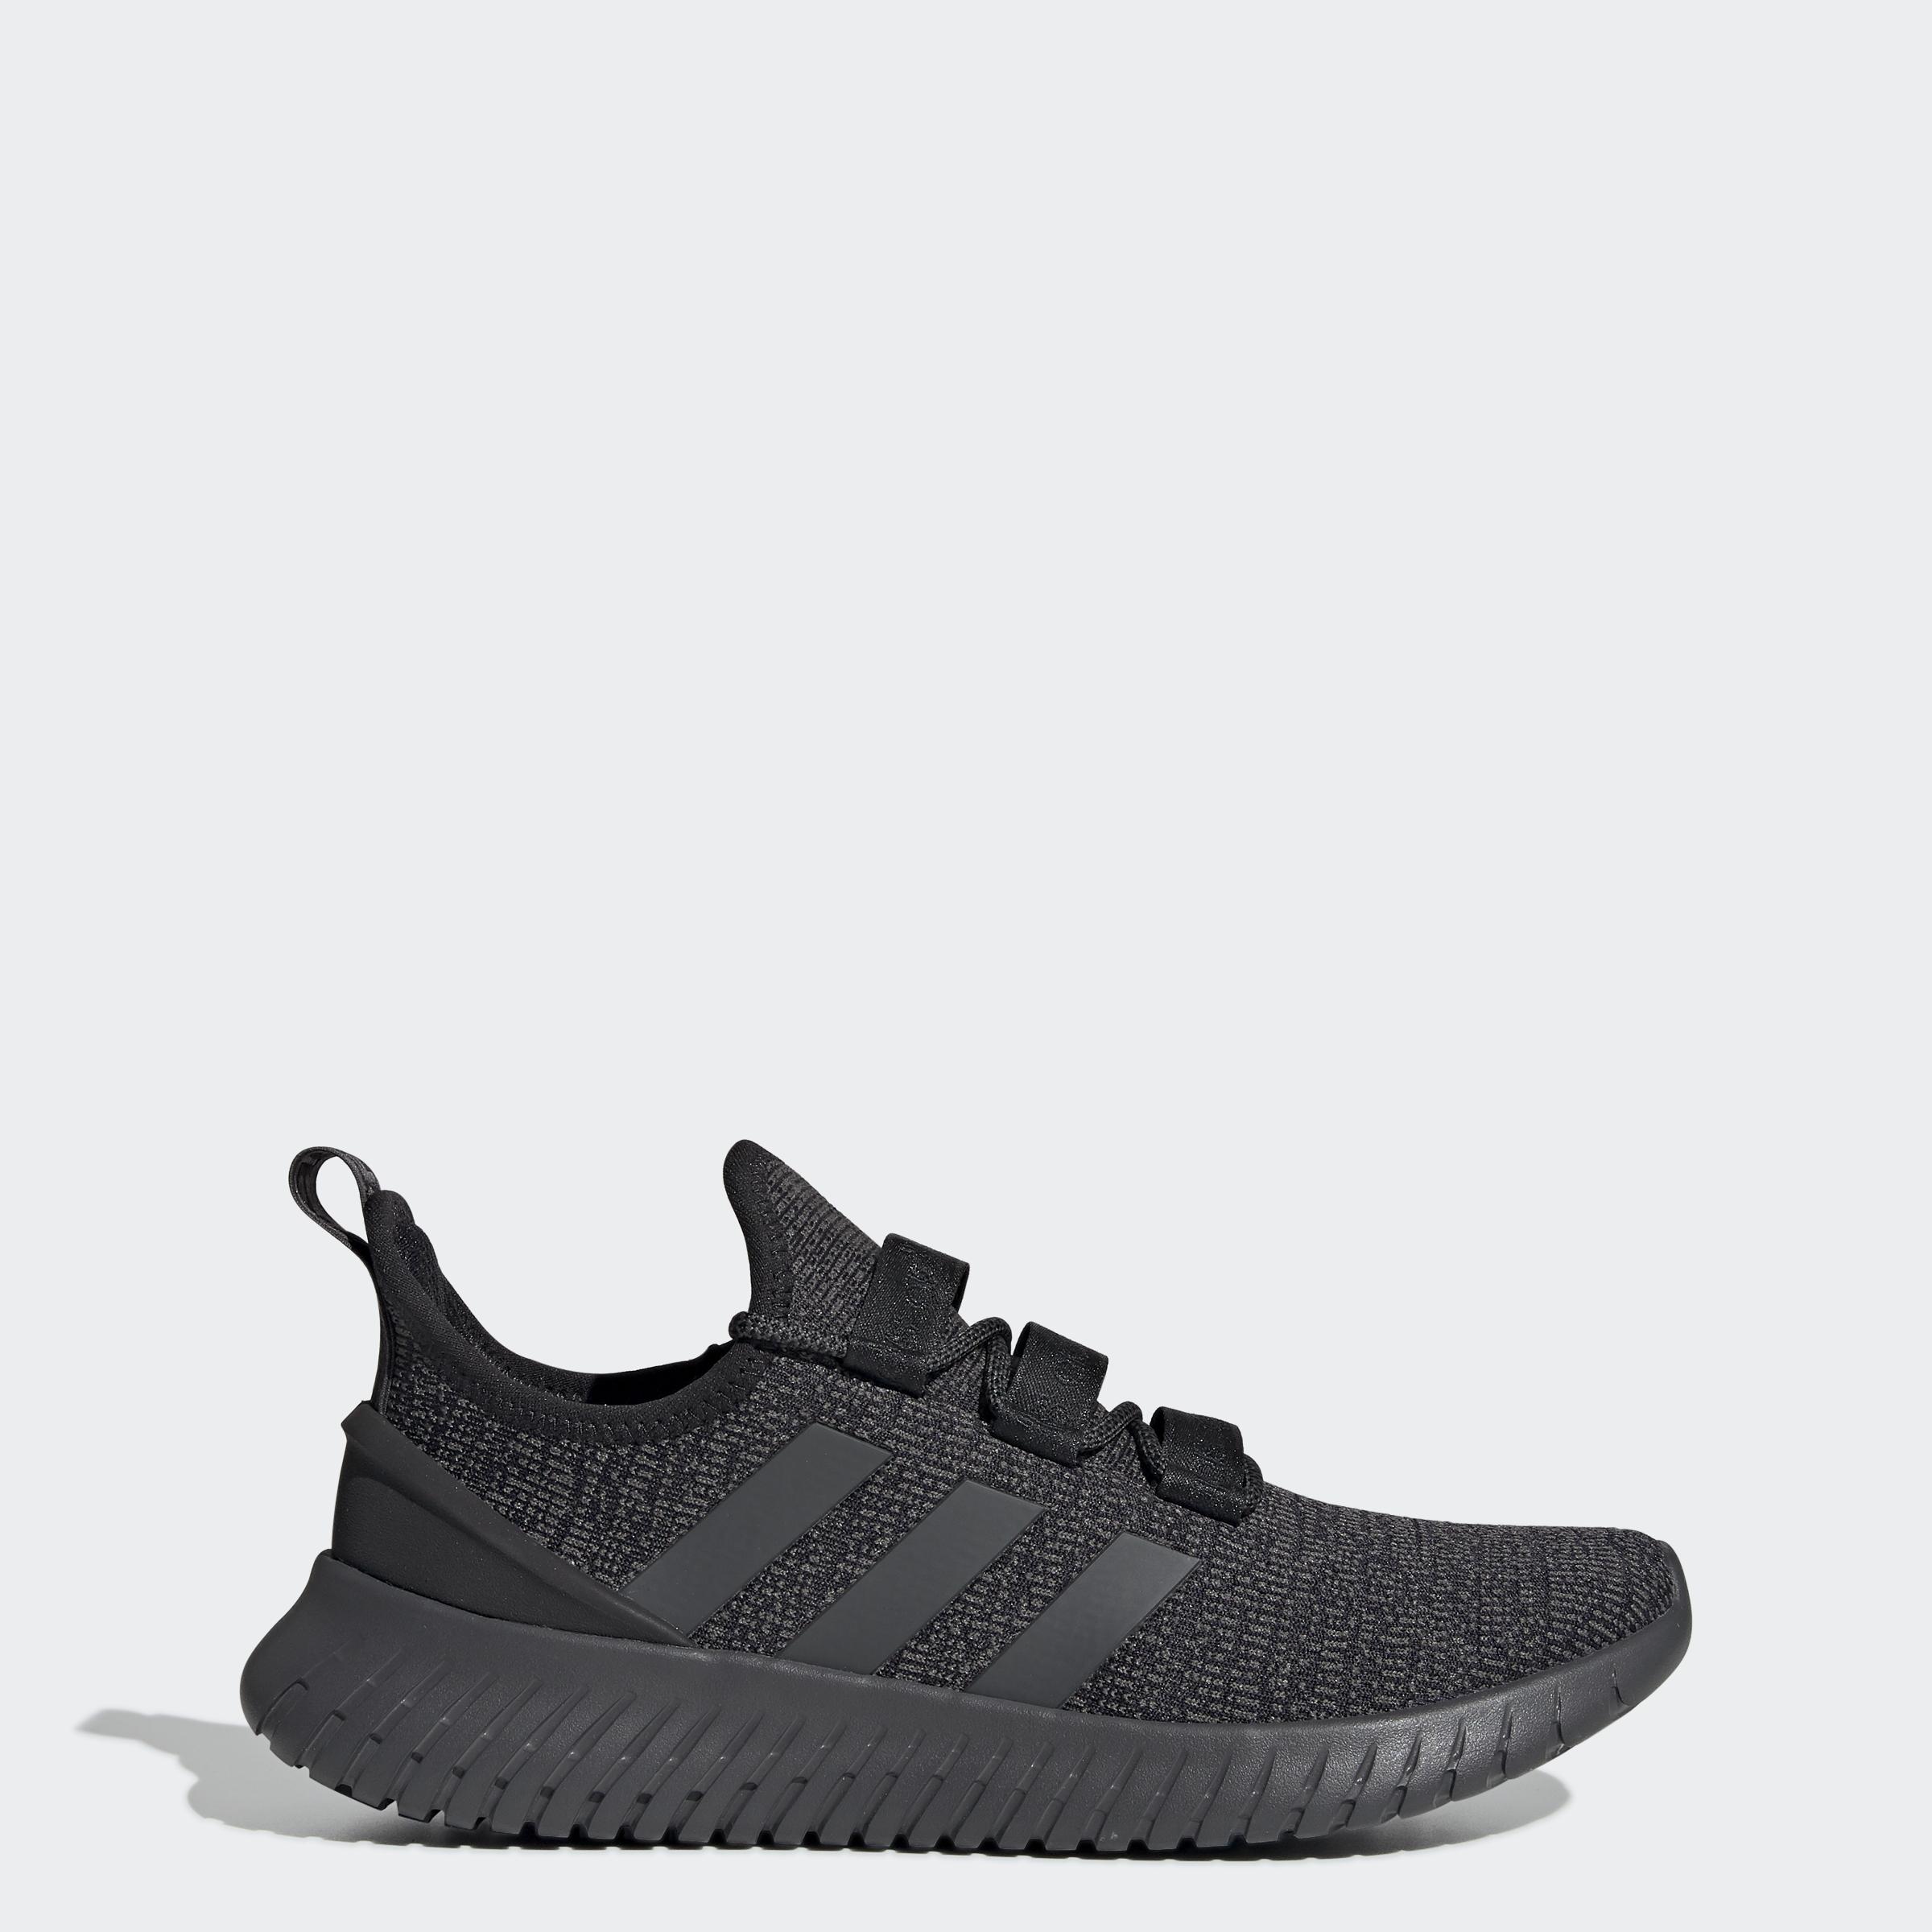 Details about adidas Kaptir Shoes Men's